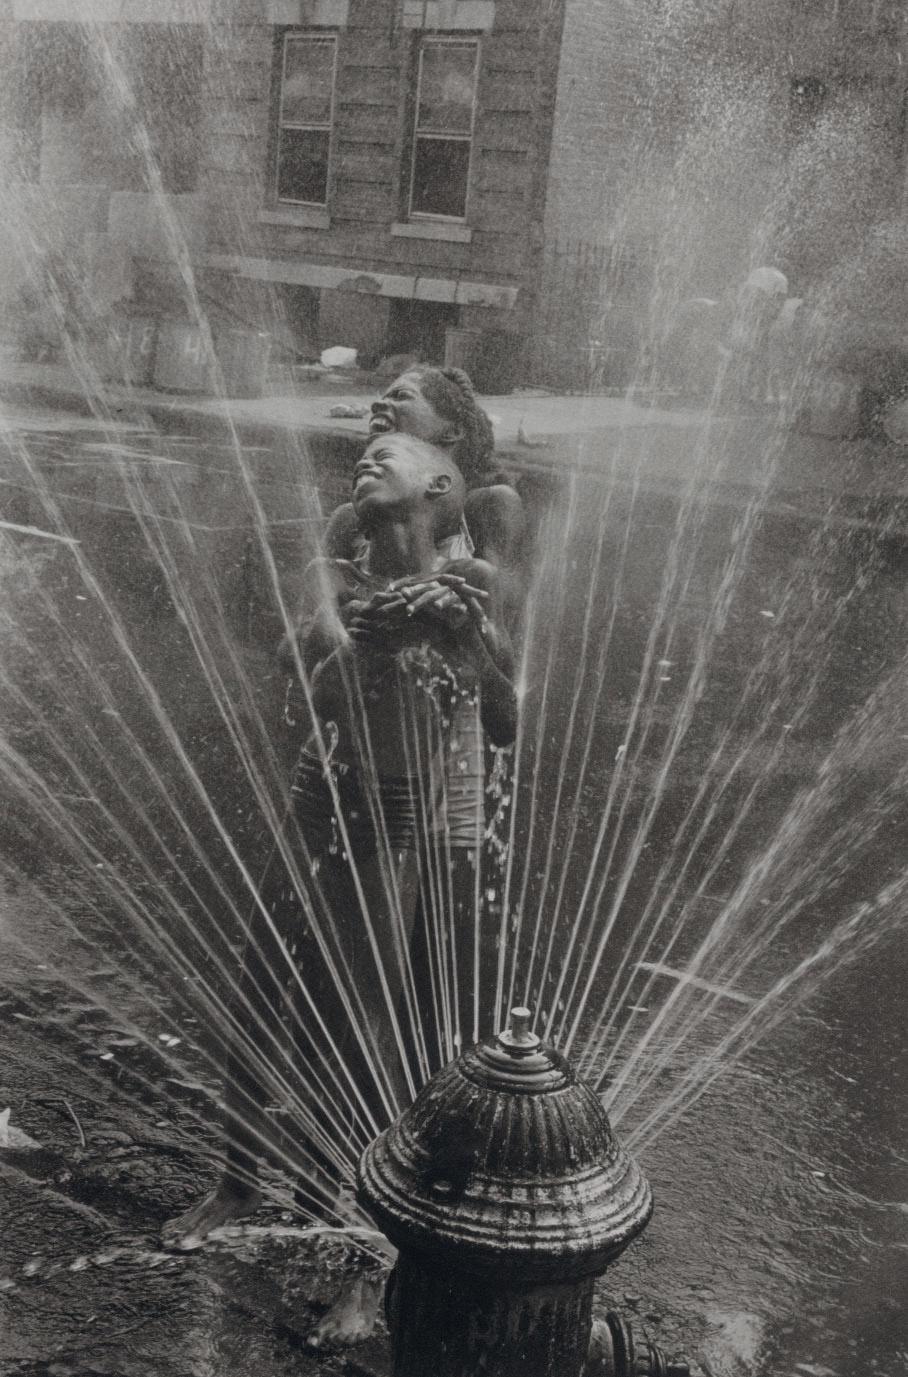 Harlem (Hydrant), New York City, 1963